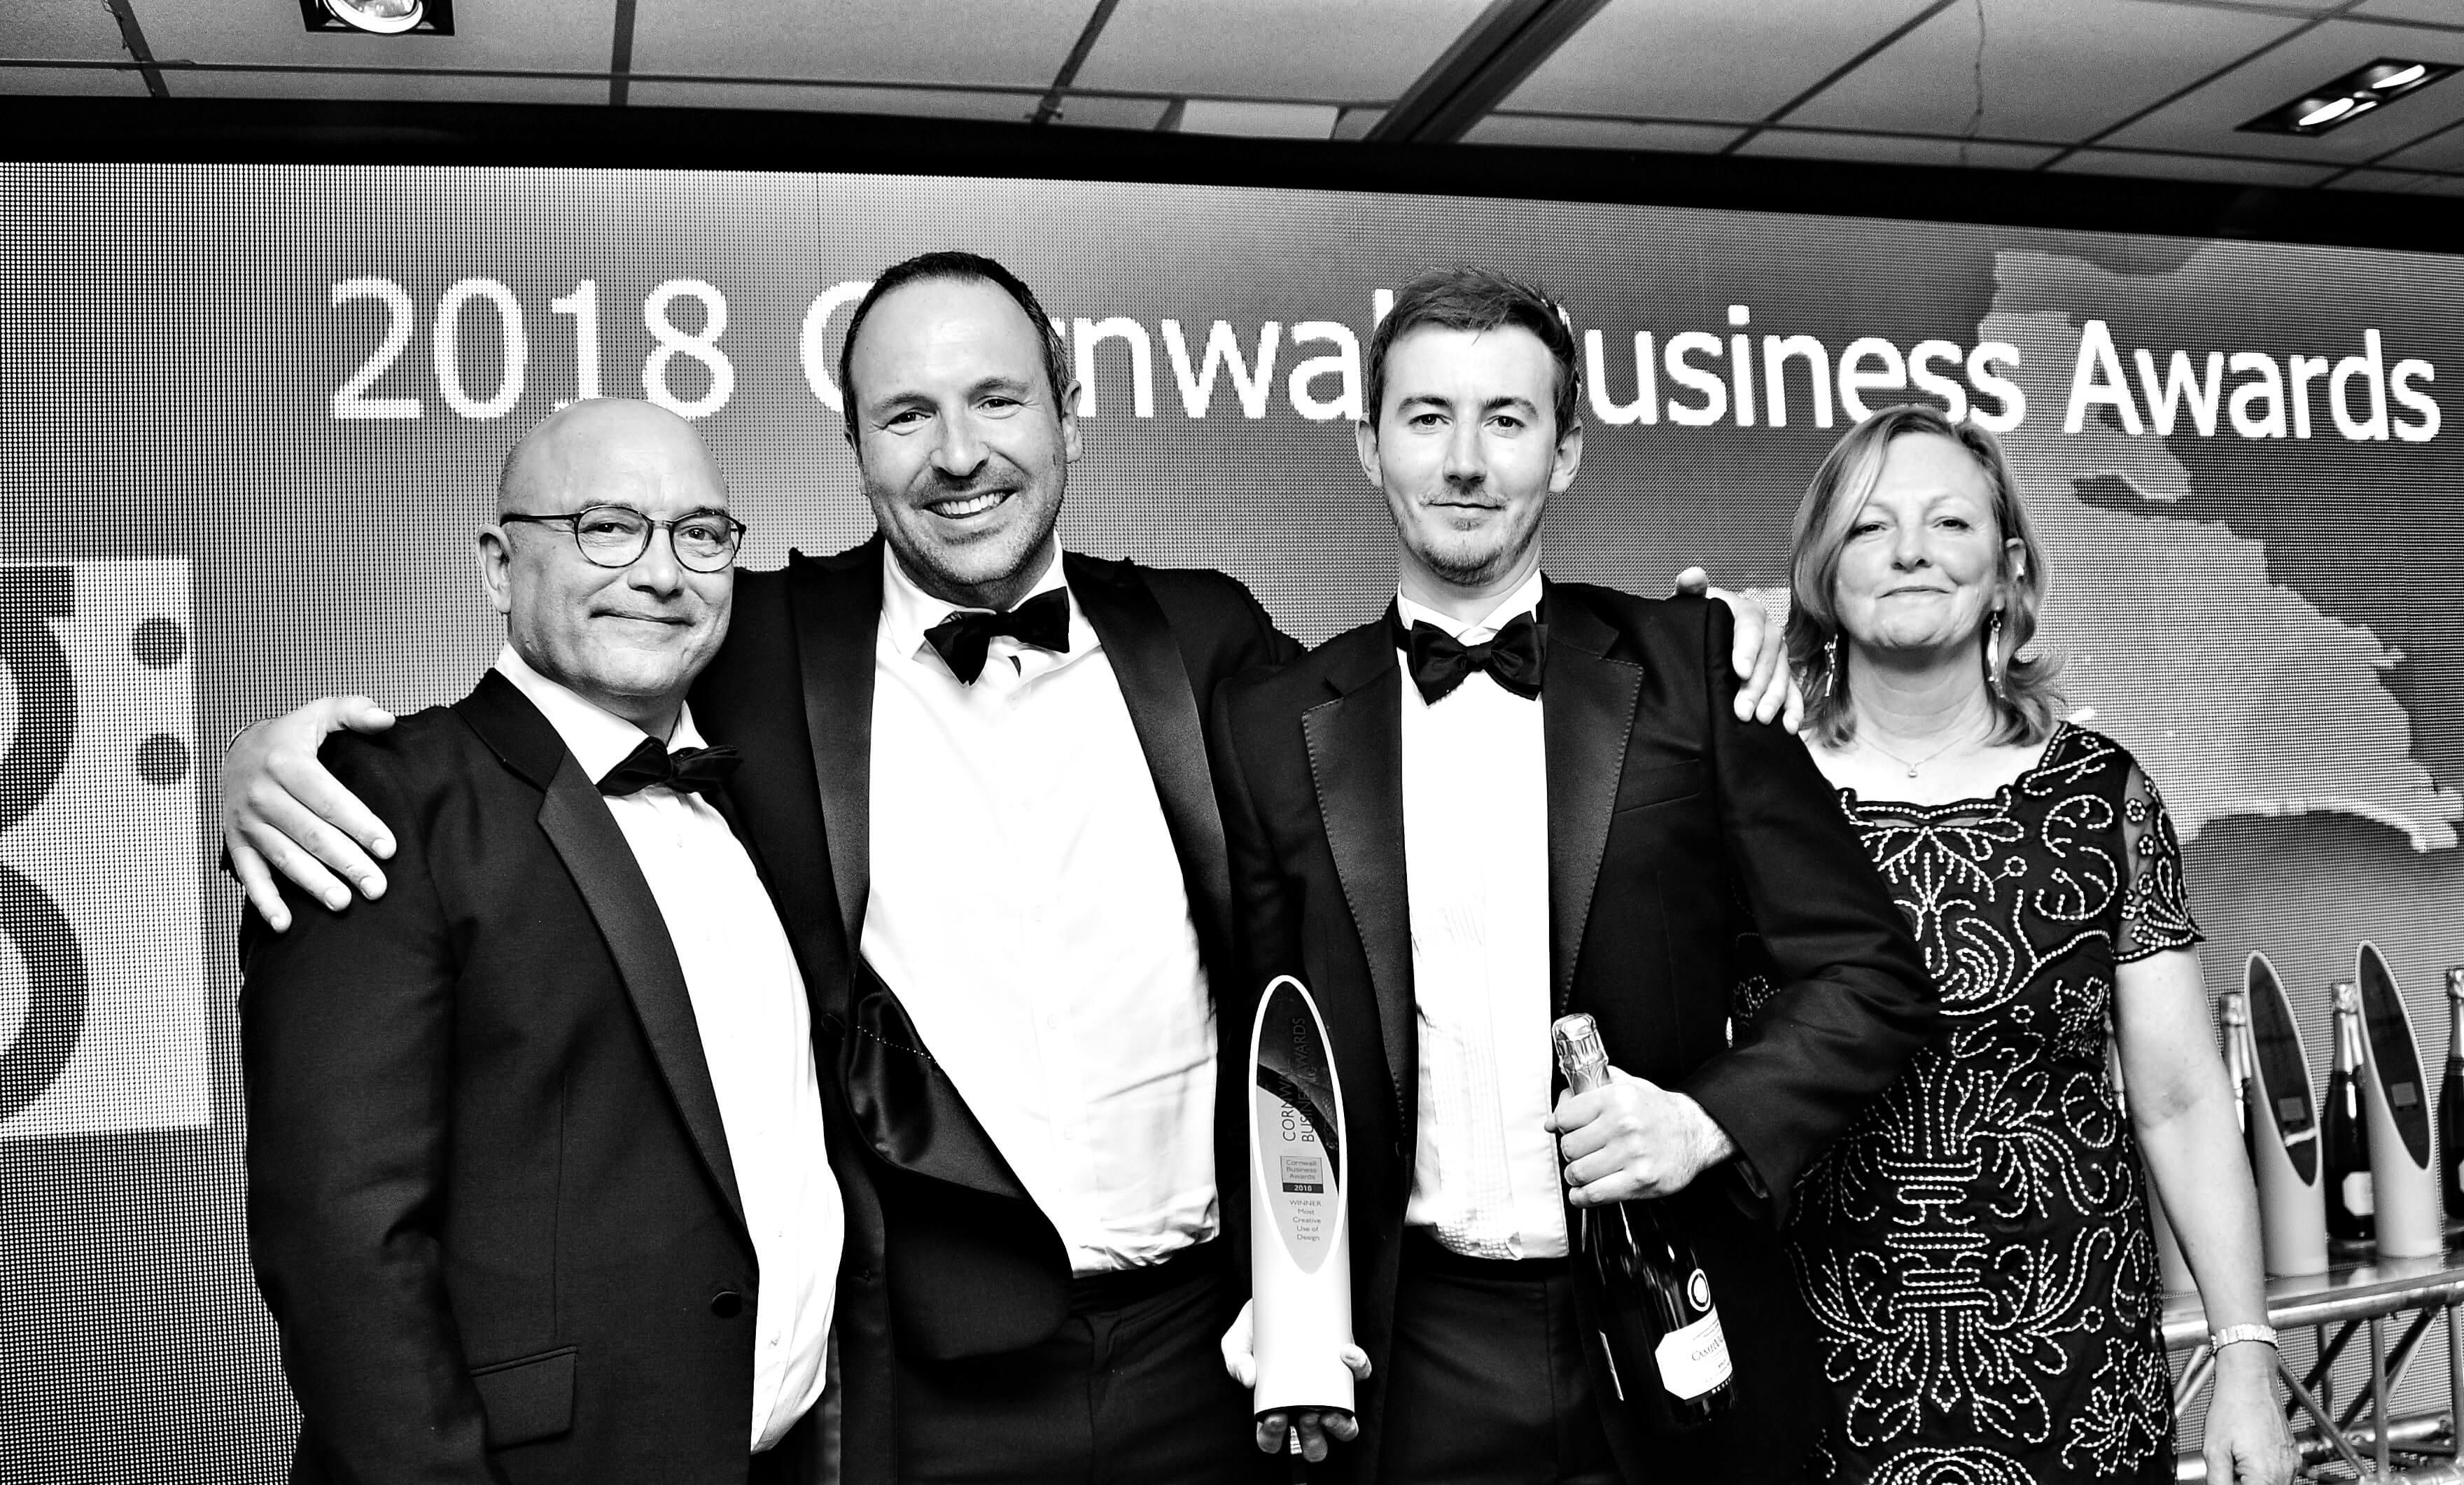 Sanders Studios_Cornwall Business Awards_Virtual Reality